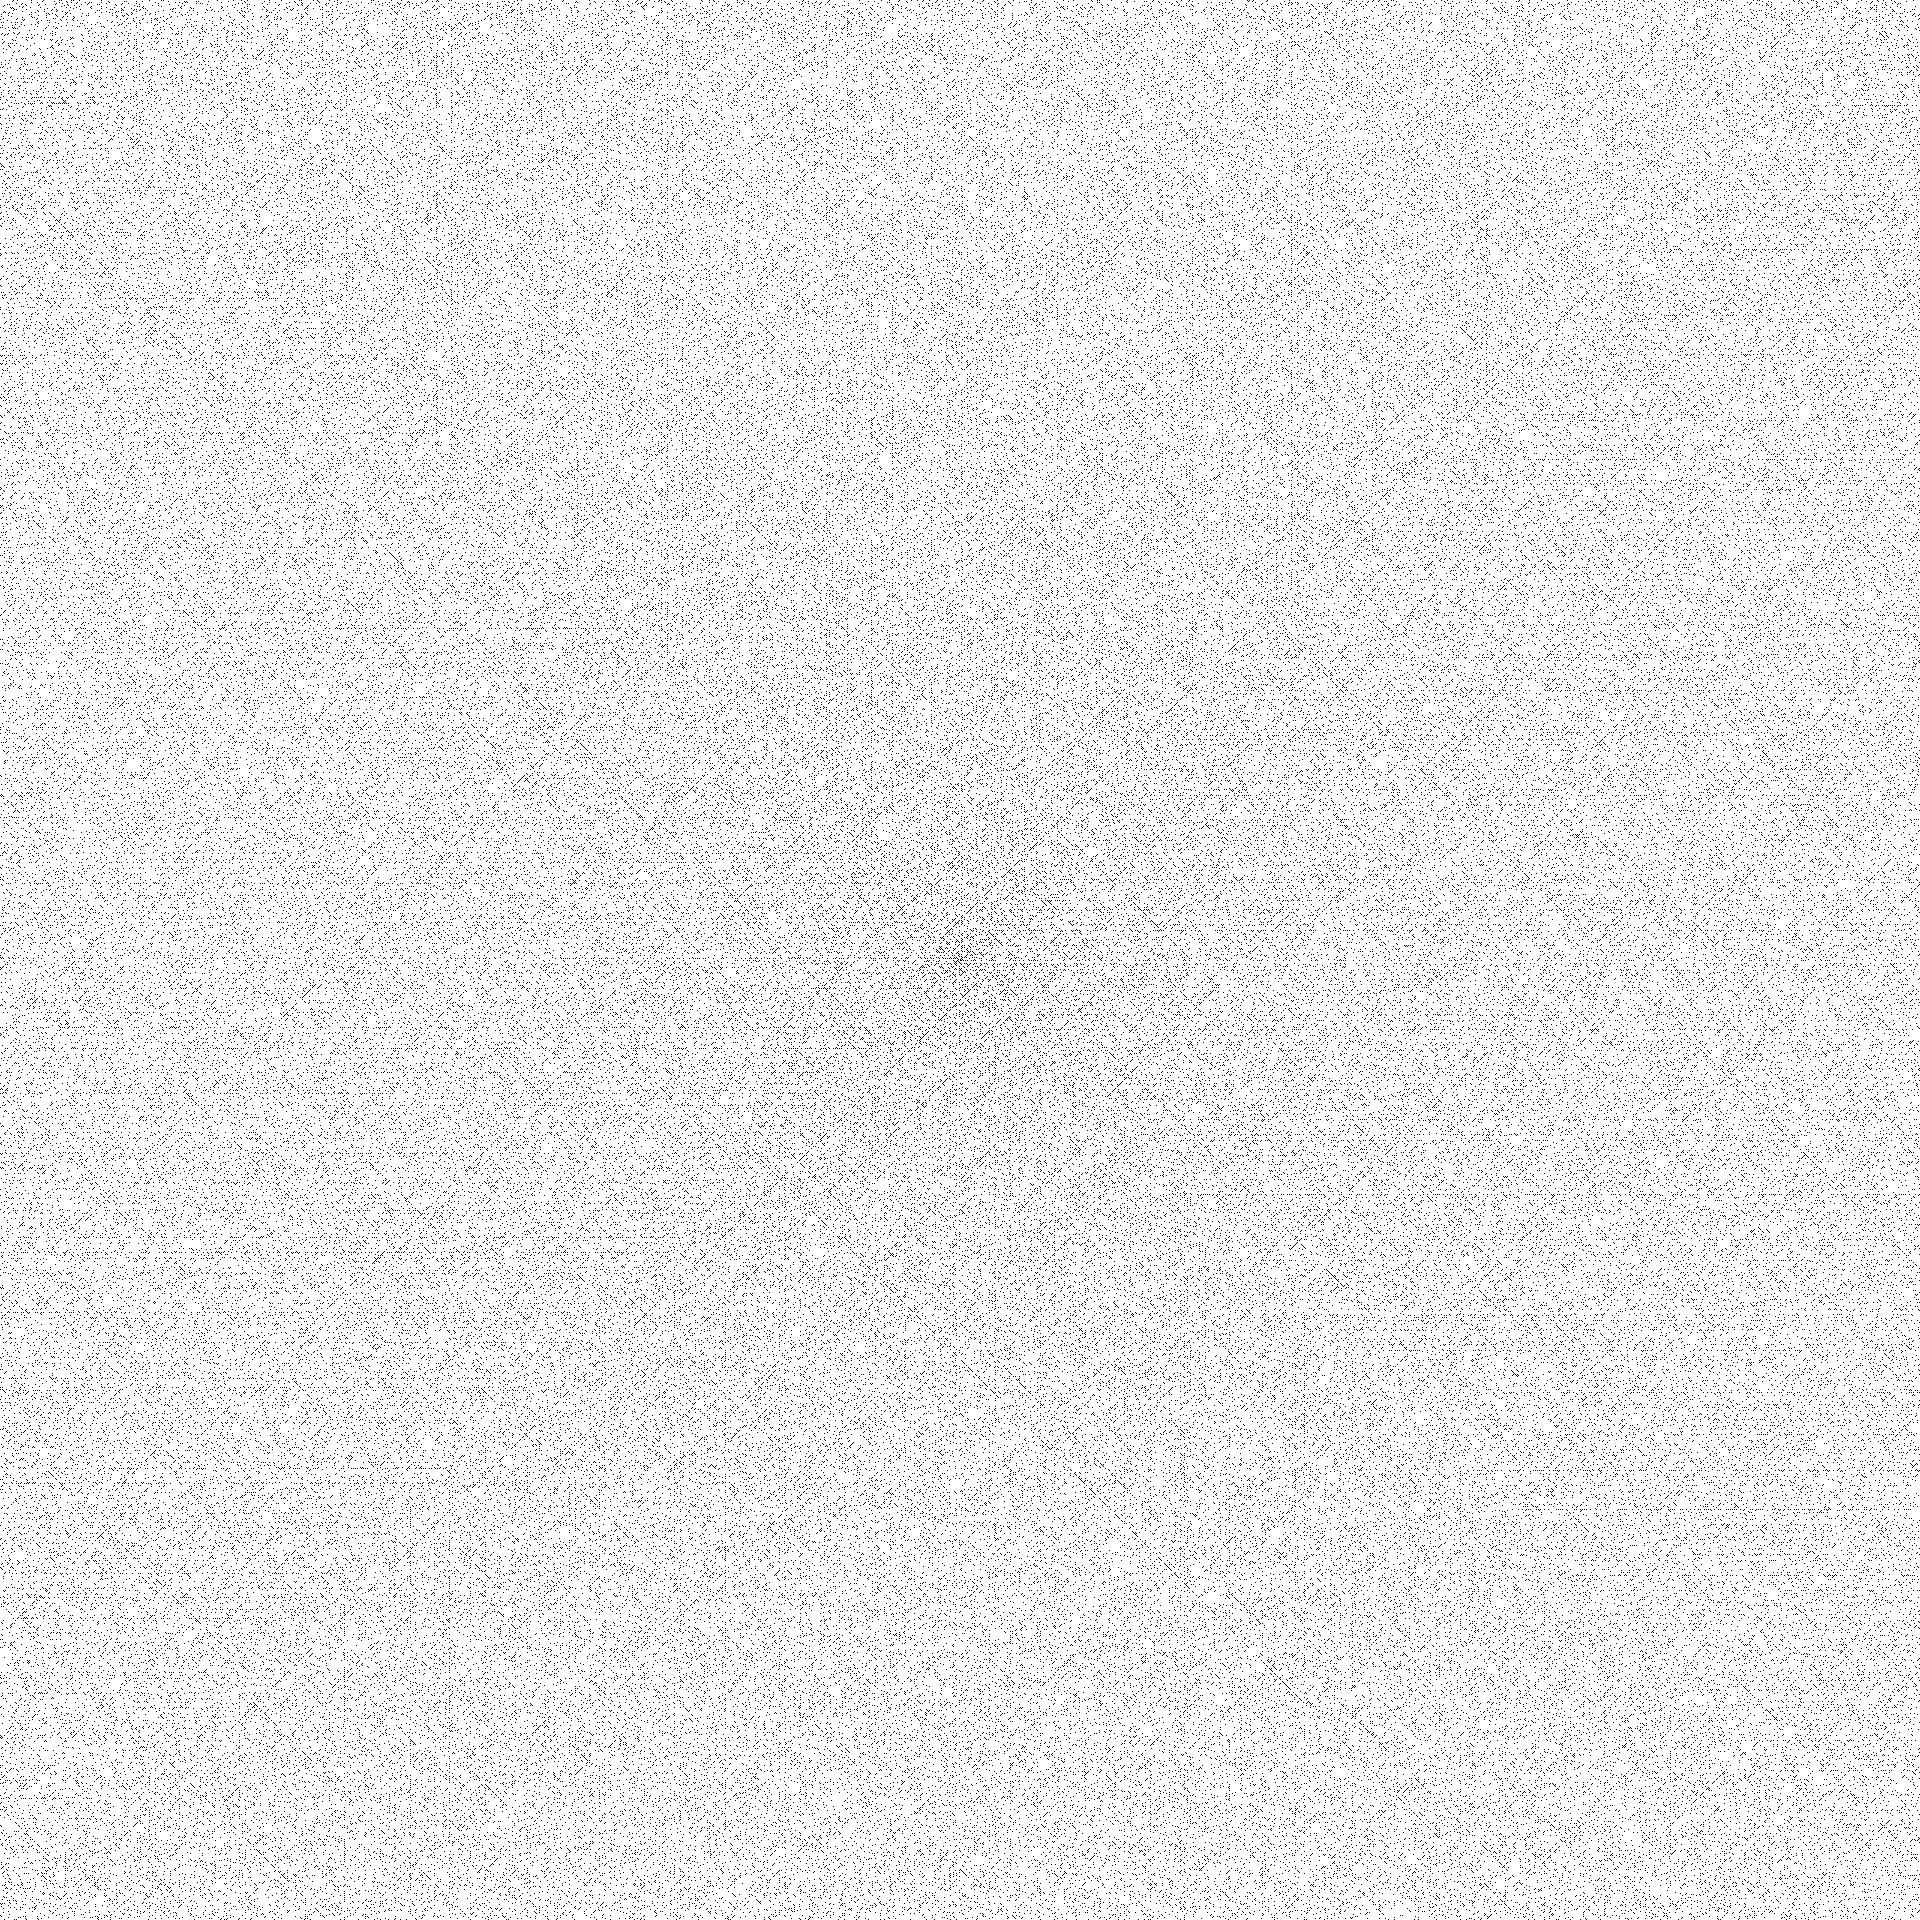 Ulam spiral 1n+1